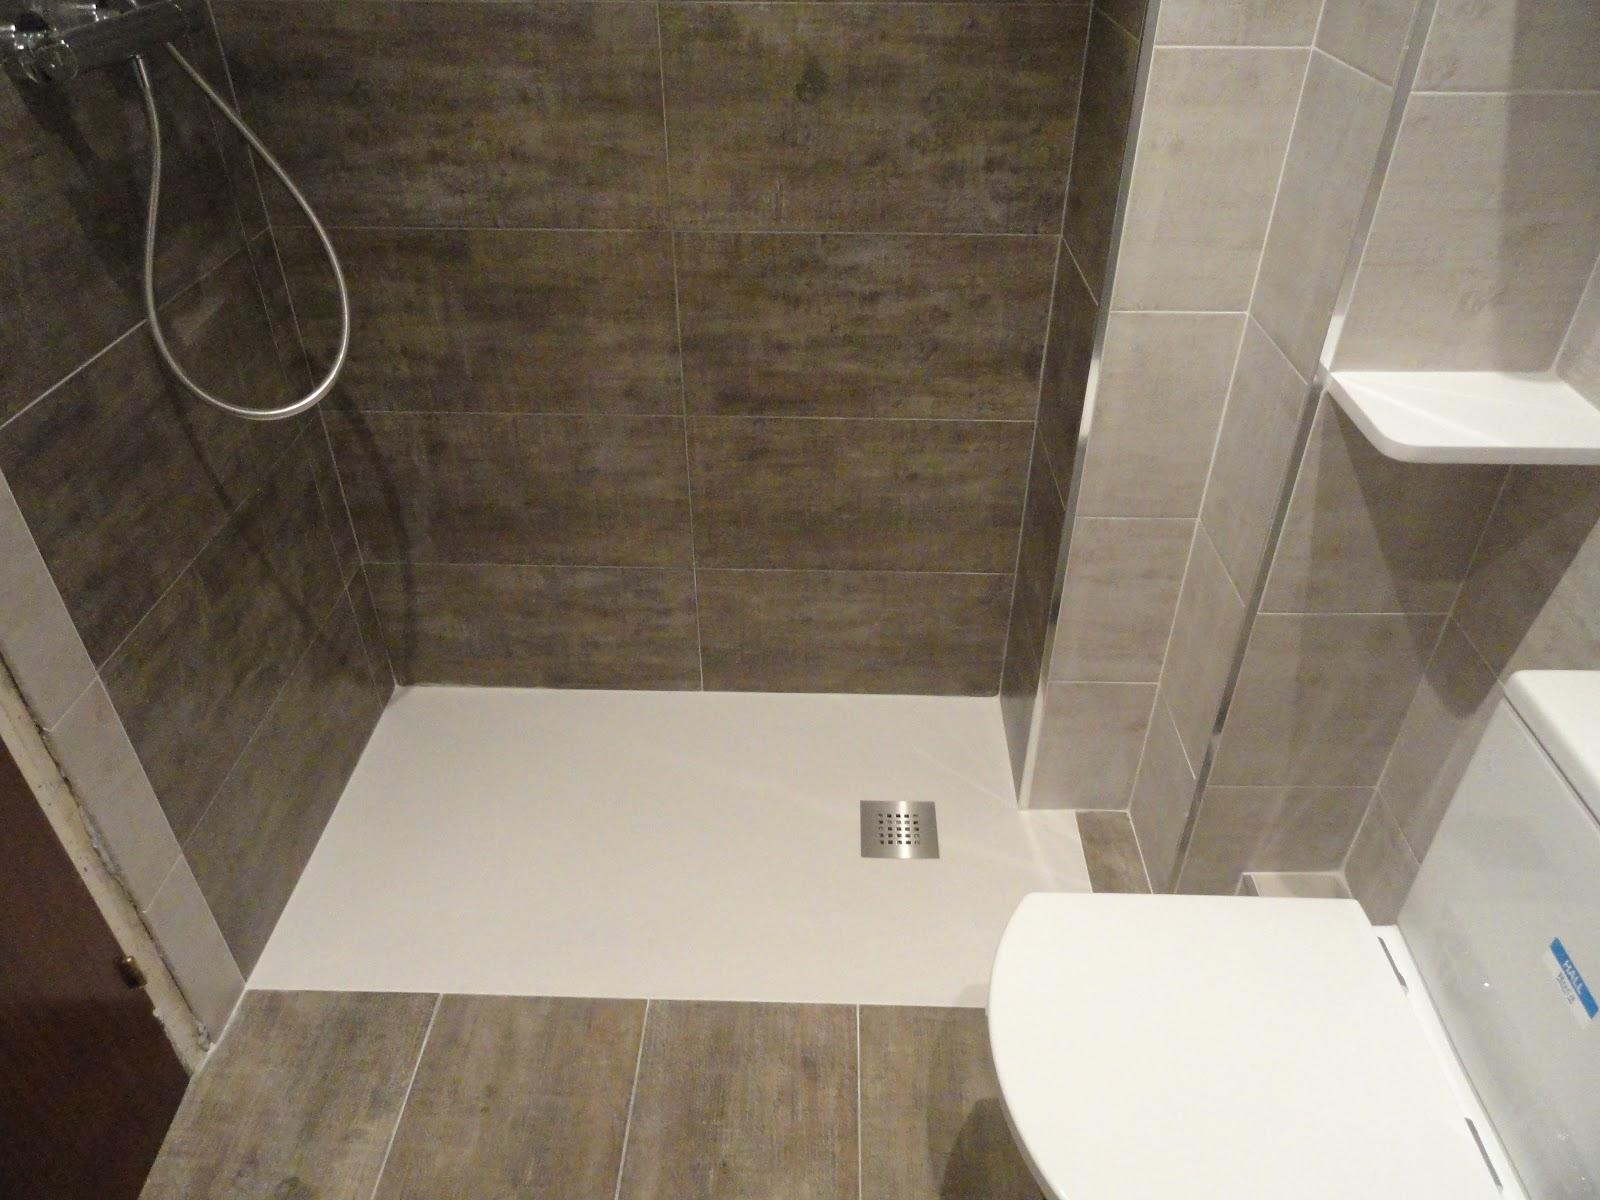 Reformas plato ducha a nivel de suelo for Ducha sin plato suelo